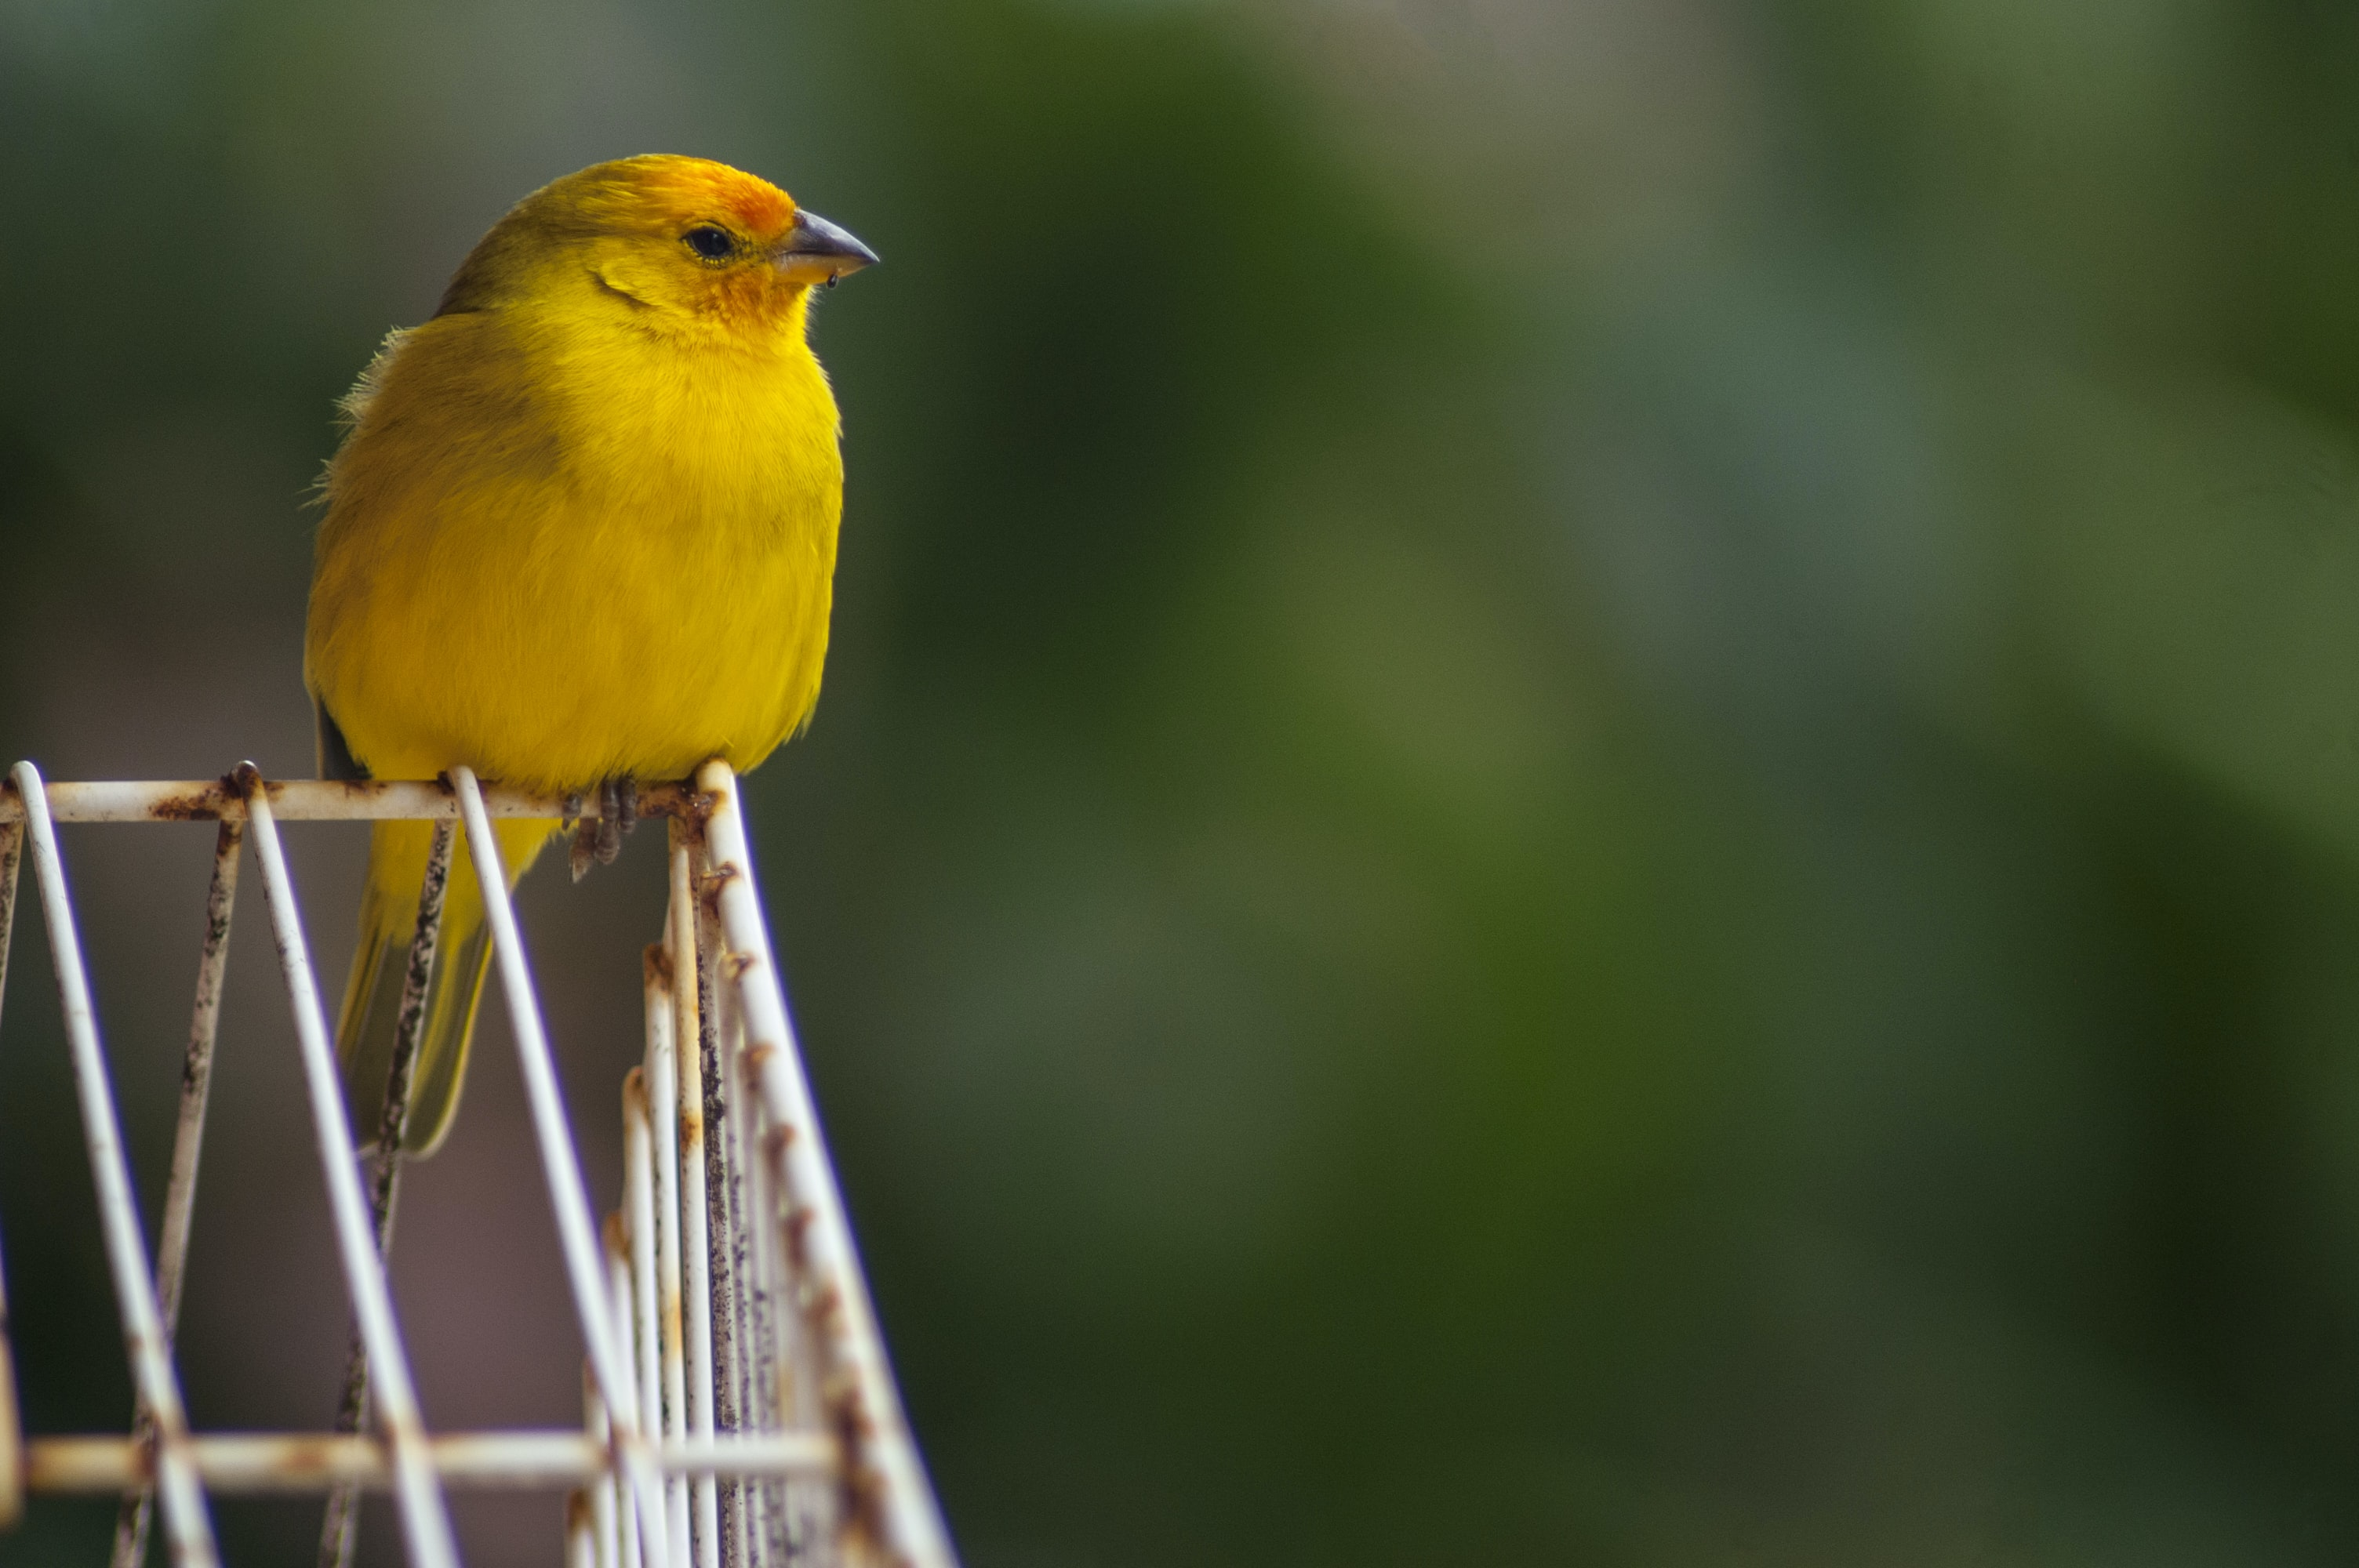 shallow focus photography of yellow bird